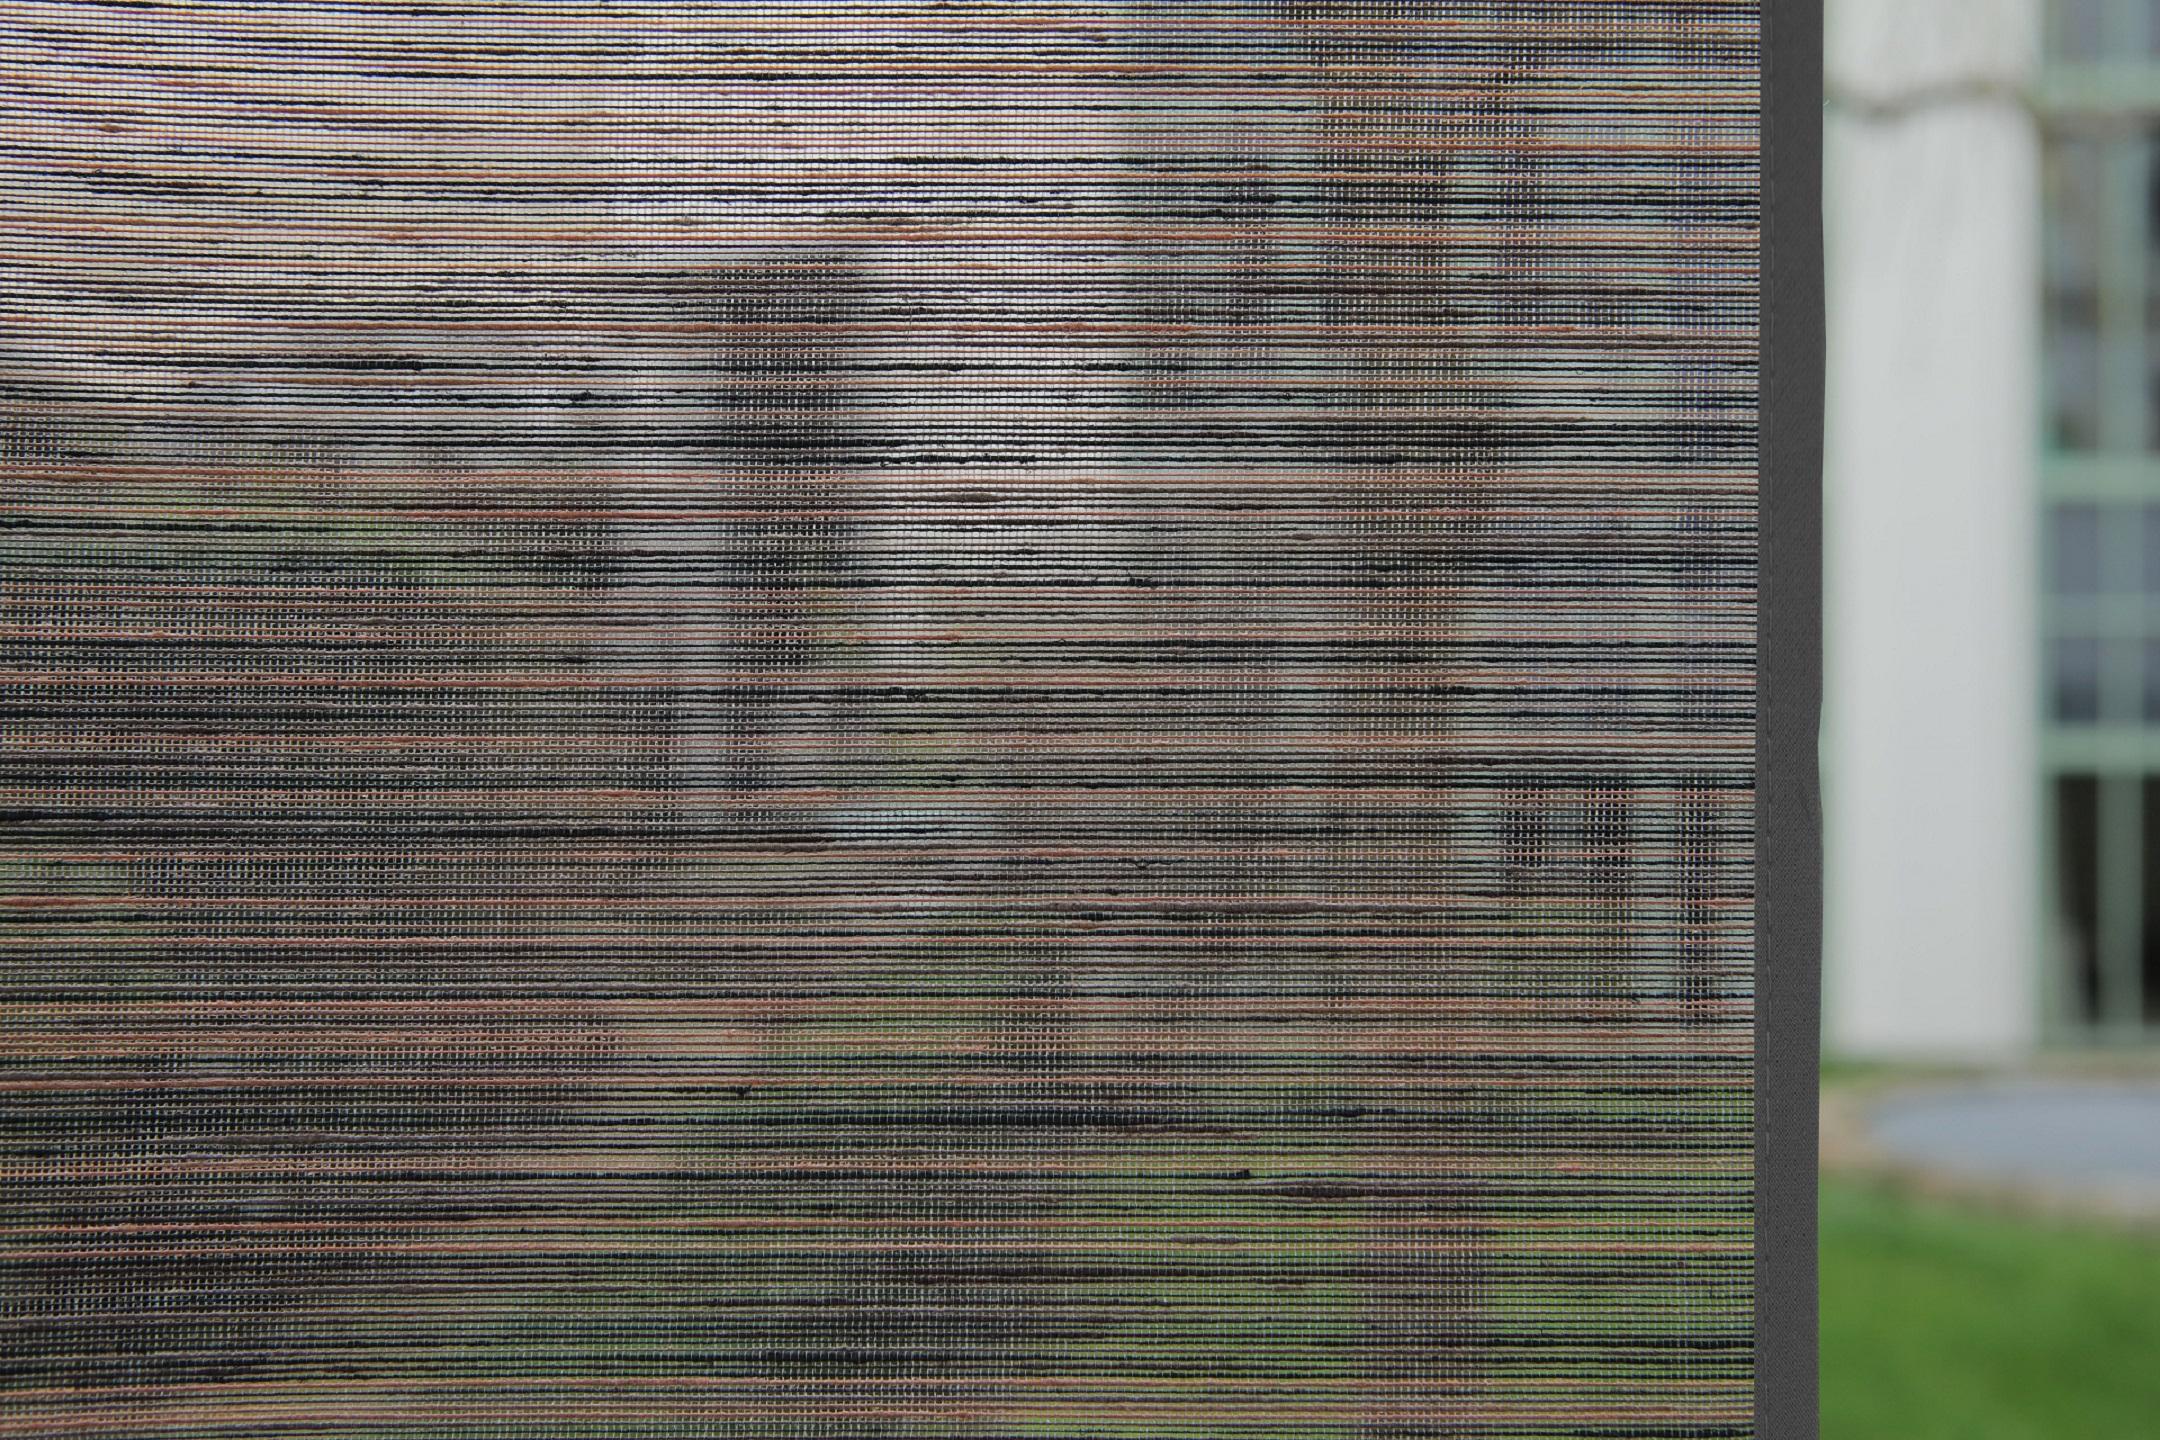 Ecran de ligne brun